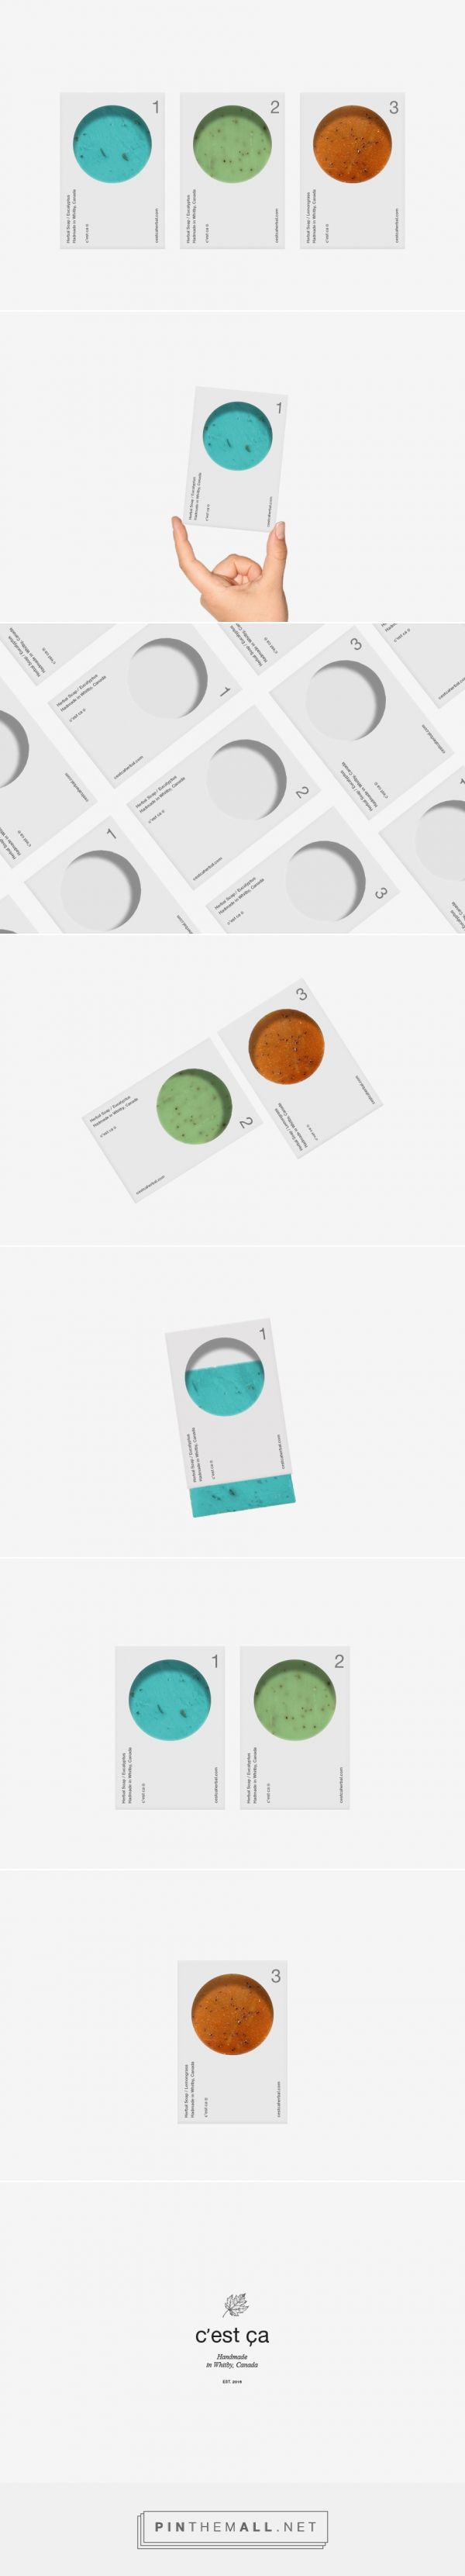 C'est Ça Handmade soap packaging design by Aleksandar Cvetković, Inc. - http://www.packagingoftheworld.com/2016/11/cest-ca.html